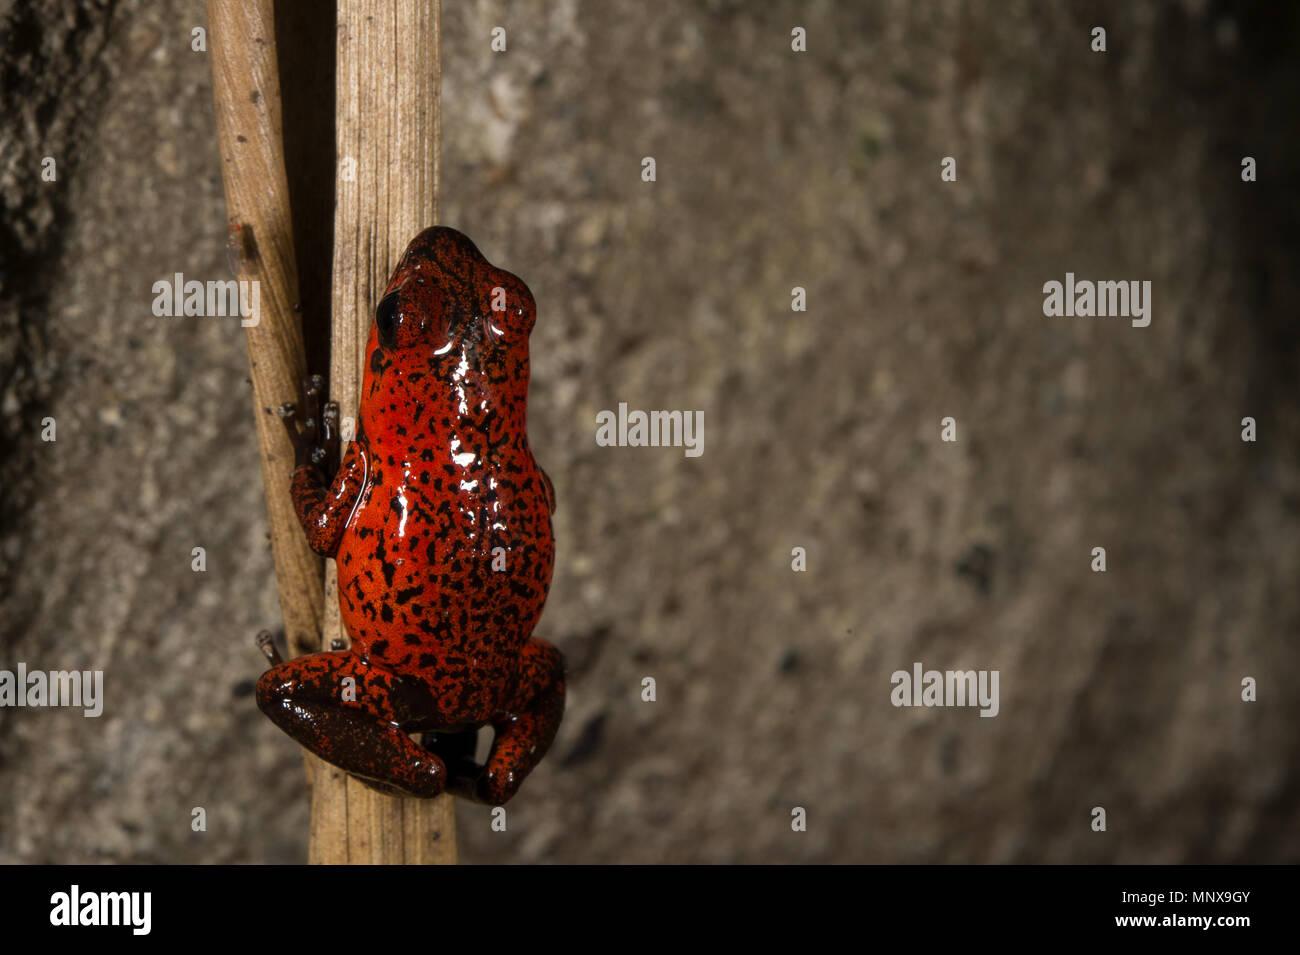 Strawberry Poison Dart Frog, Oophaga (Dendrobates) pumilio, Dendrobatidae, Costa Rica - Stock Image